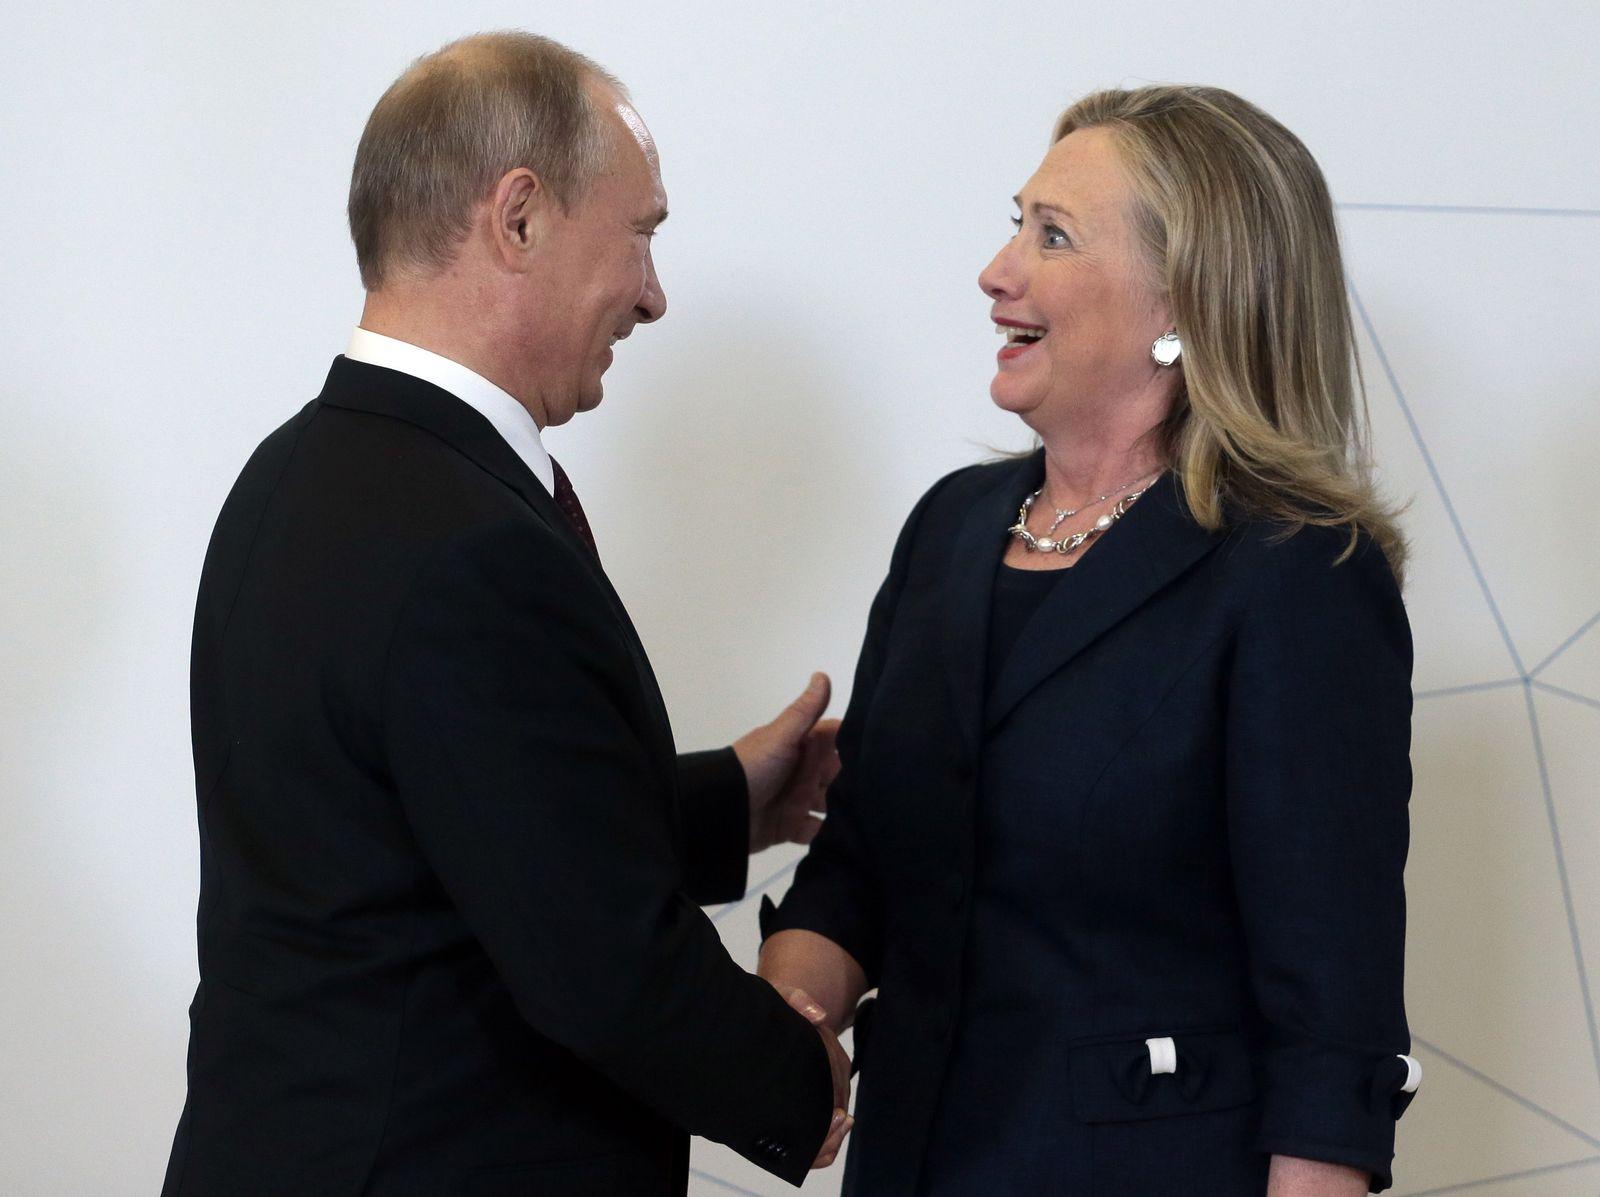 USA / Wahlkampf / Russland / Wladimir Putin / Hillary Clinton